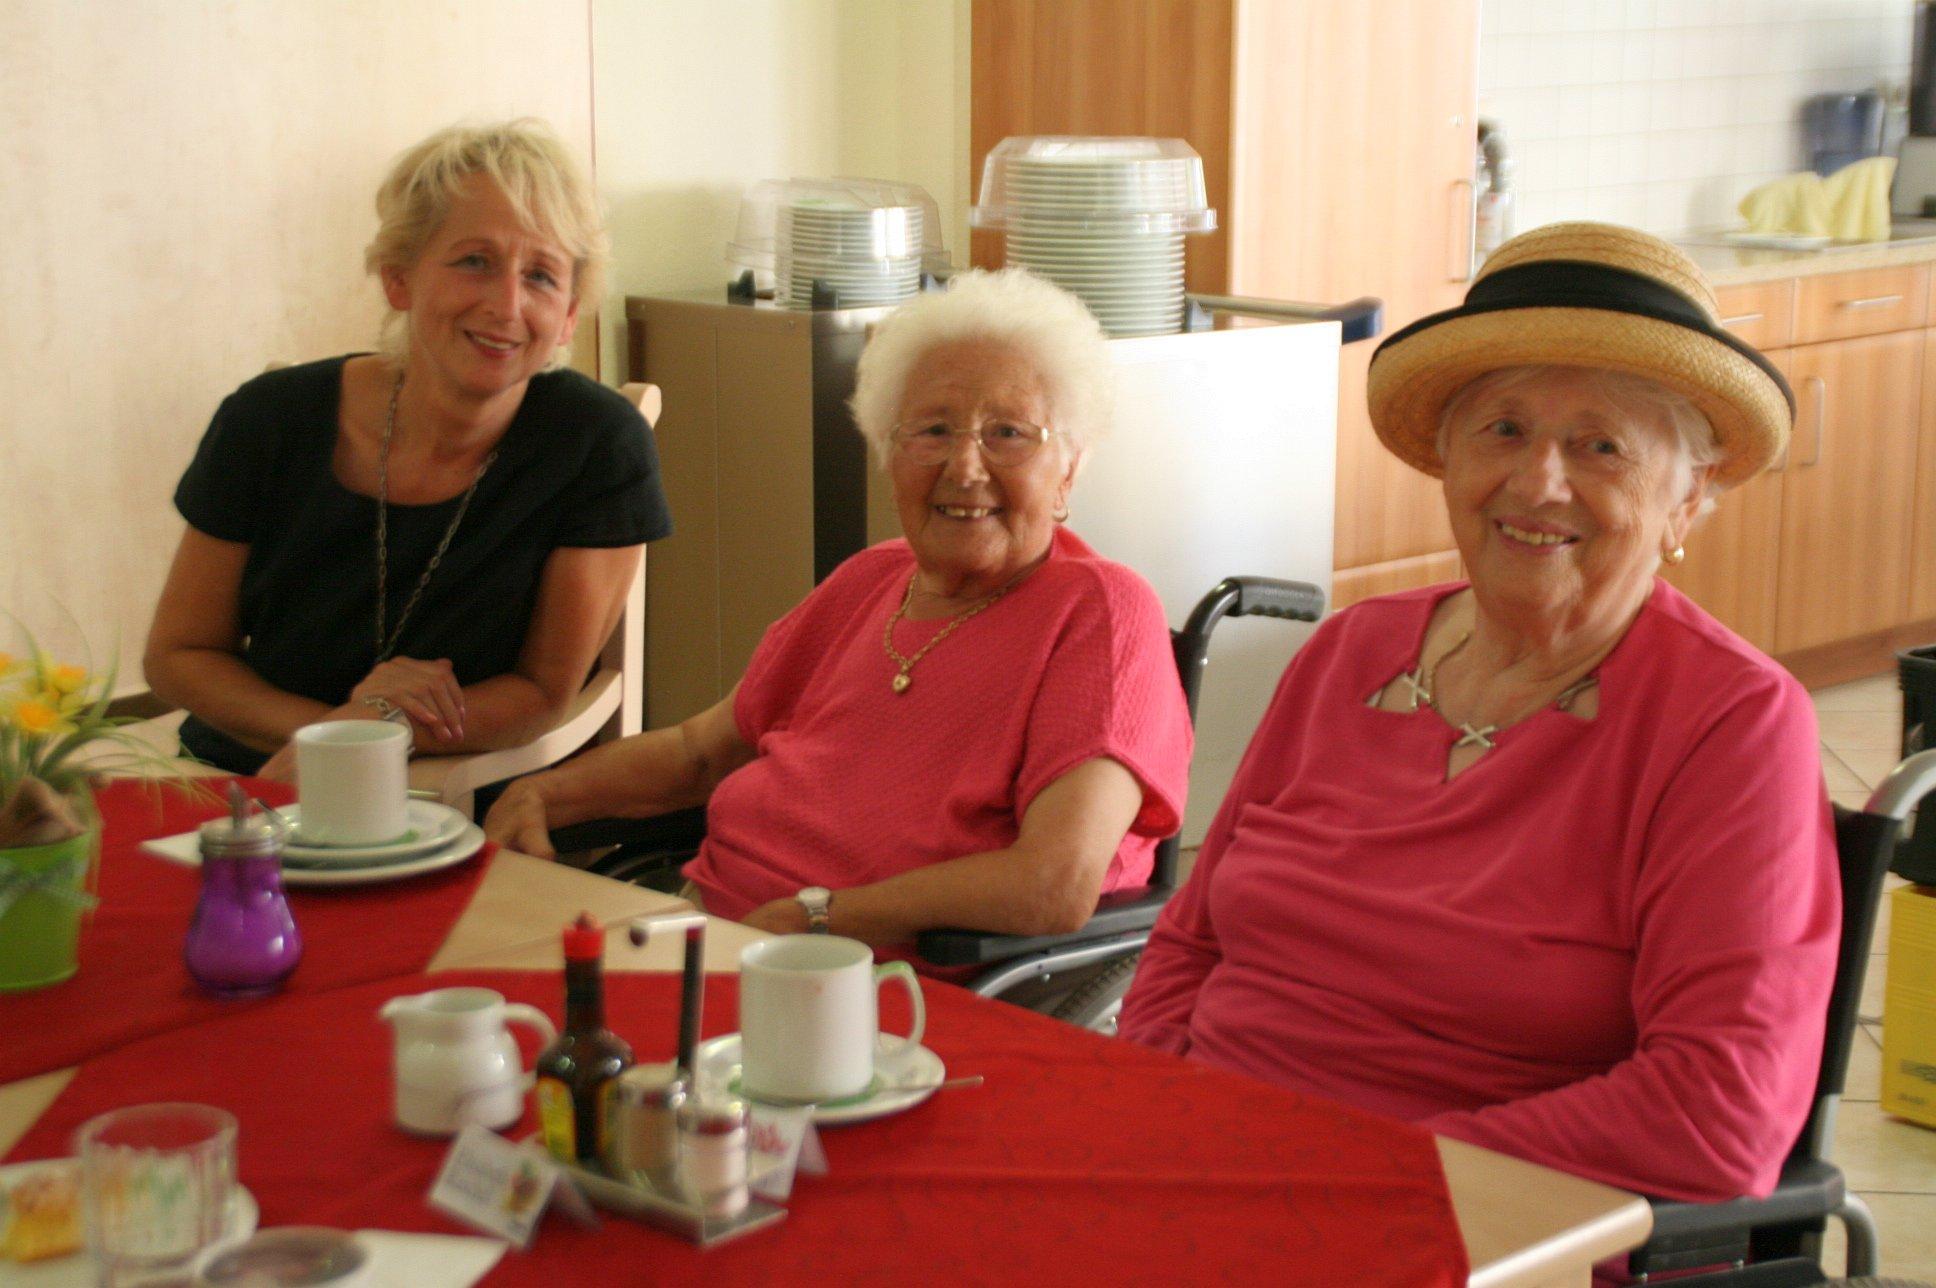 seniorenbetreuung-muenchen-lebensfreude-66-plus-kaffeekraenzchen